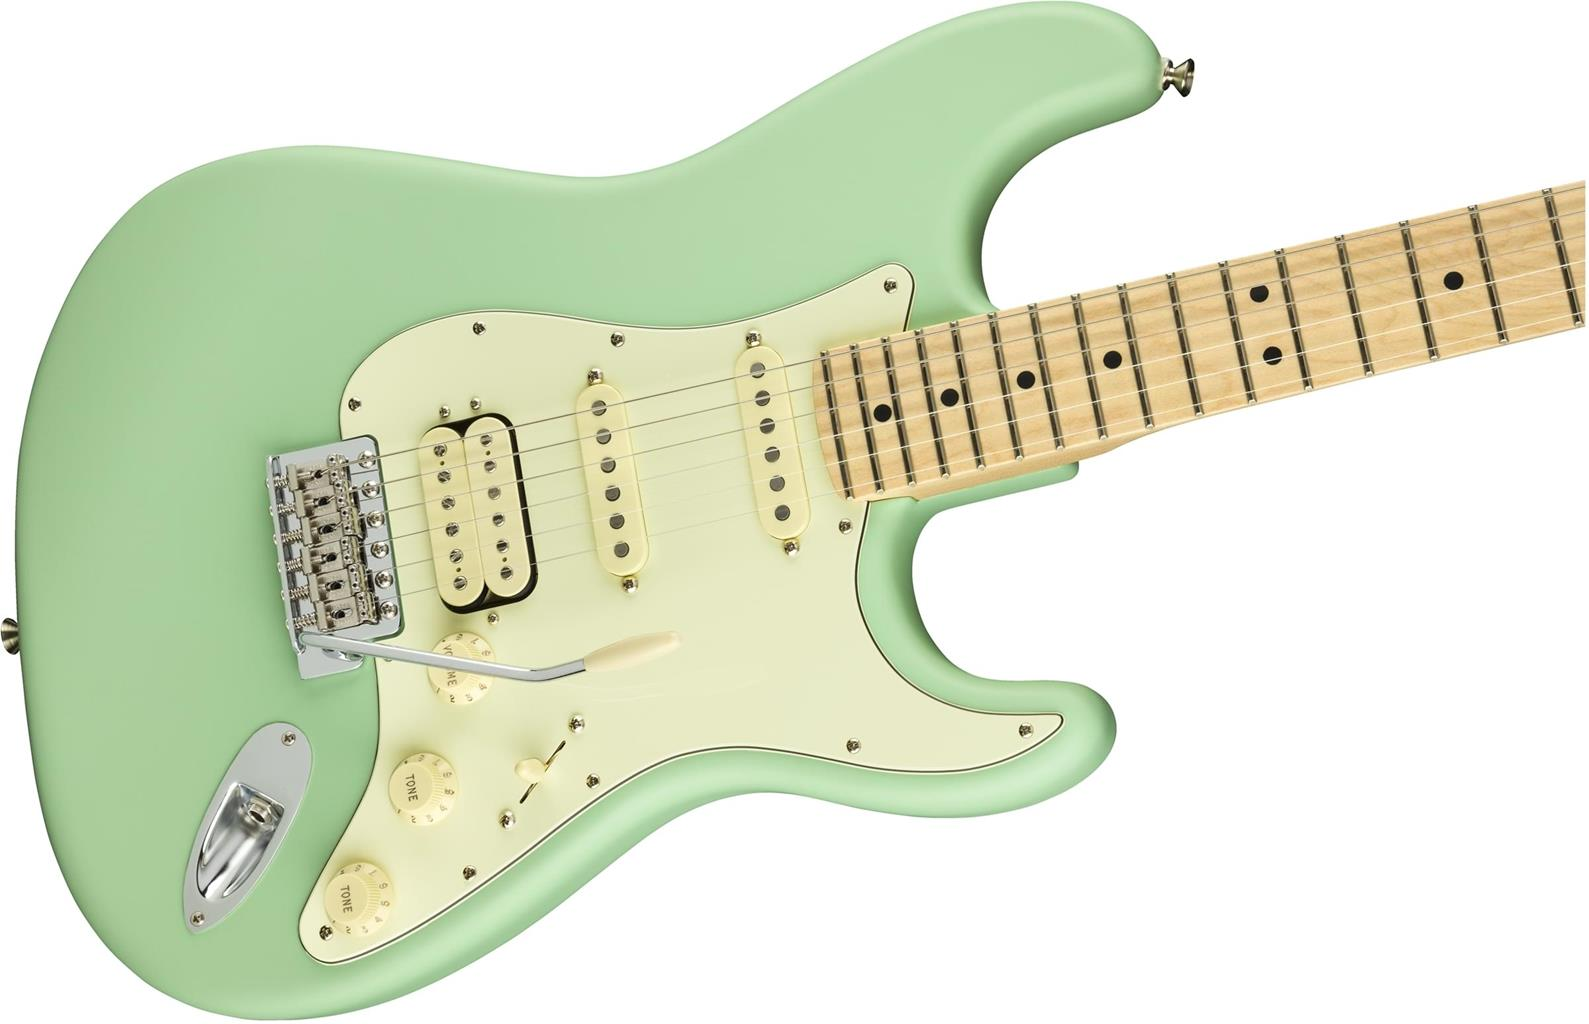 FENDER American Performer Stratocaster HSS MN Satin Surf Green 0114922357